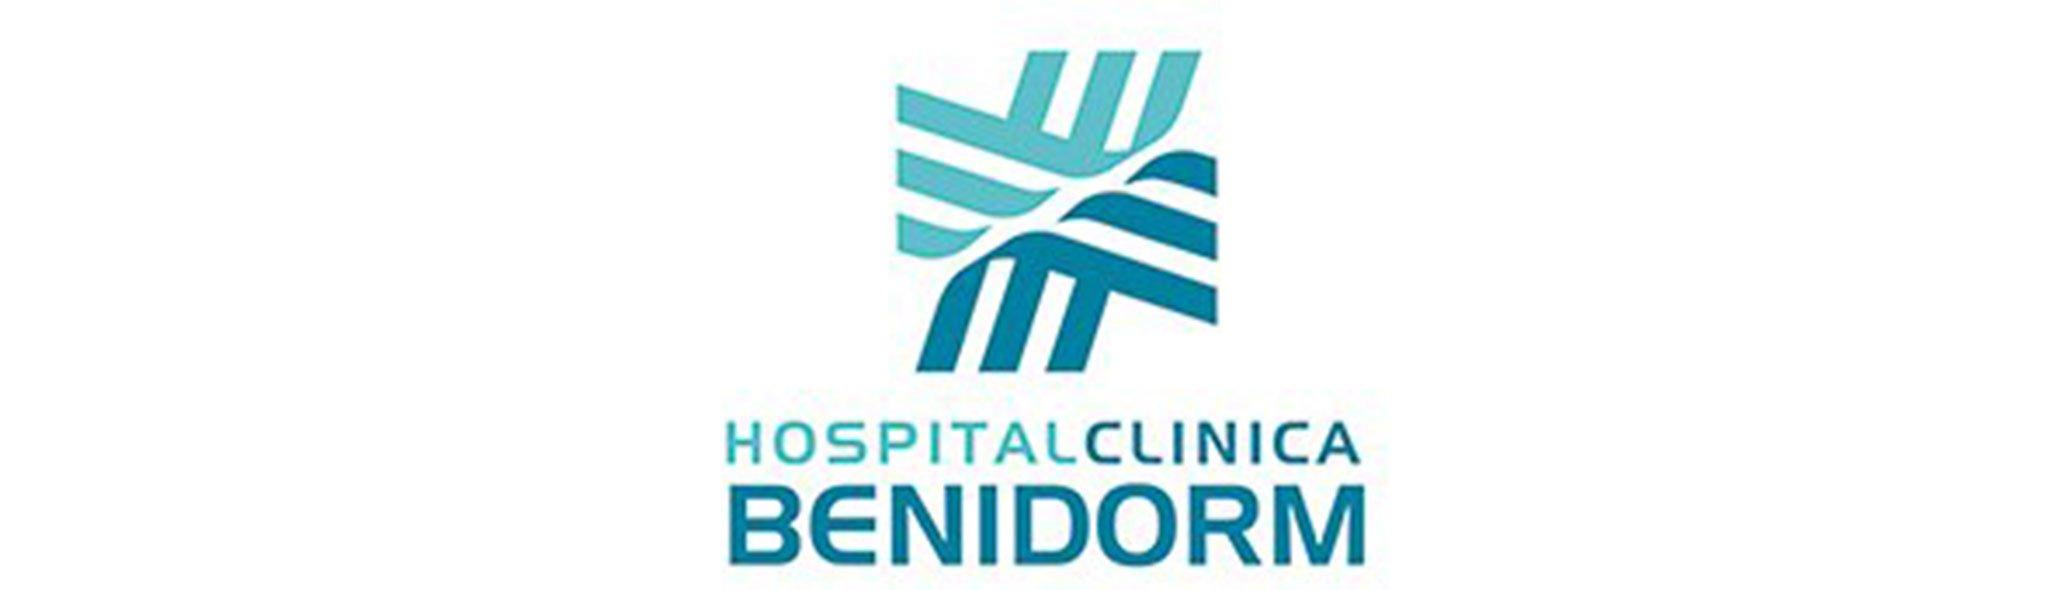 Logotipo de Hospital Clínica Benidorm (HCB)